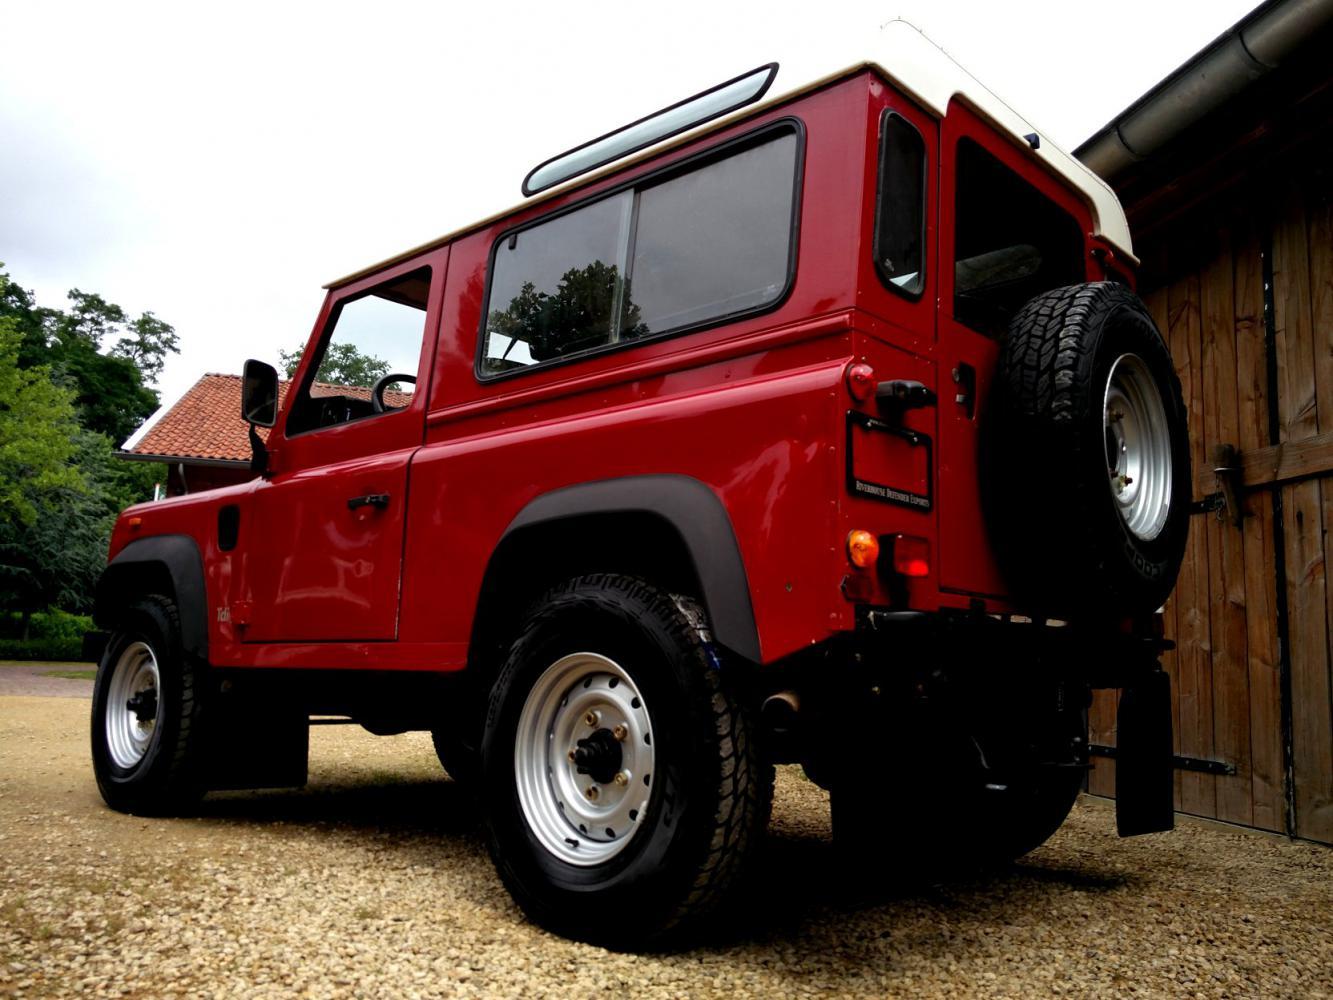 Click image for larger version  Name:1992 LR LHD Defender 90 Red 200 Tdi left rear low.jpg Views:237 Size:154.0 KB ID:263650